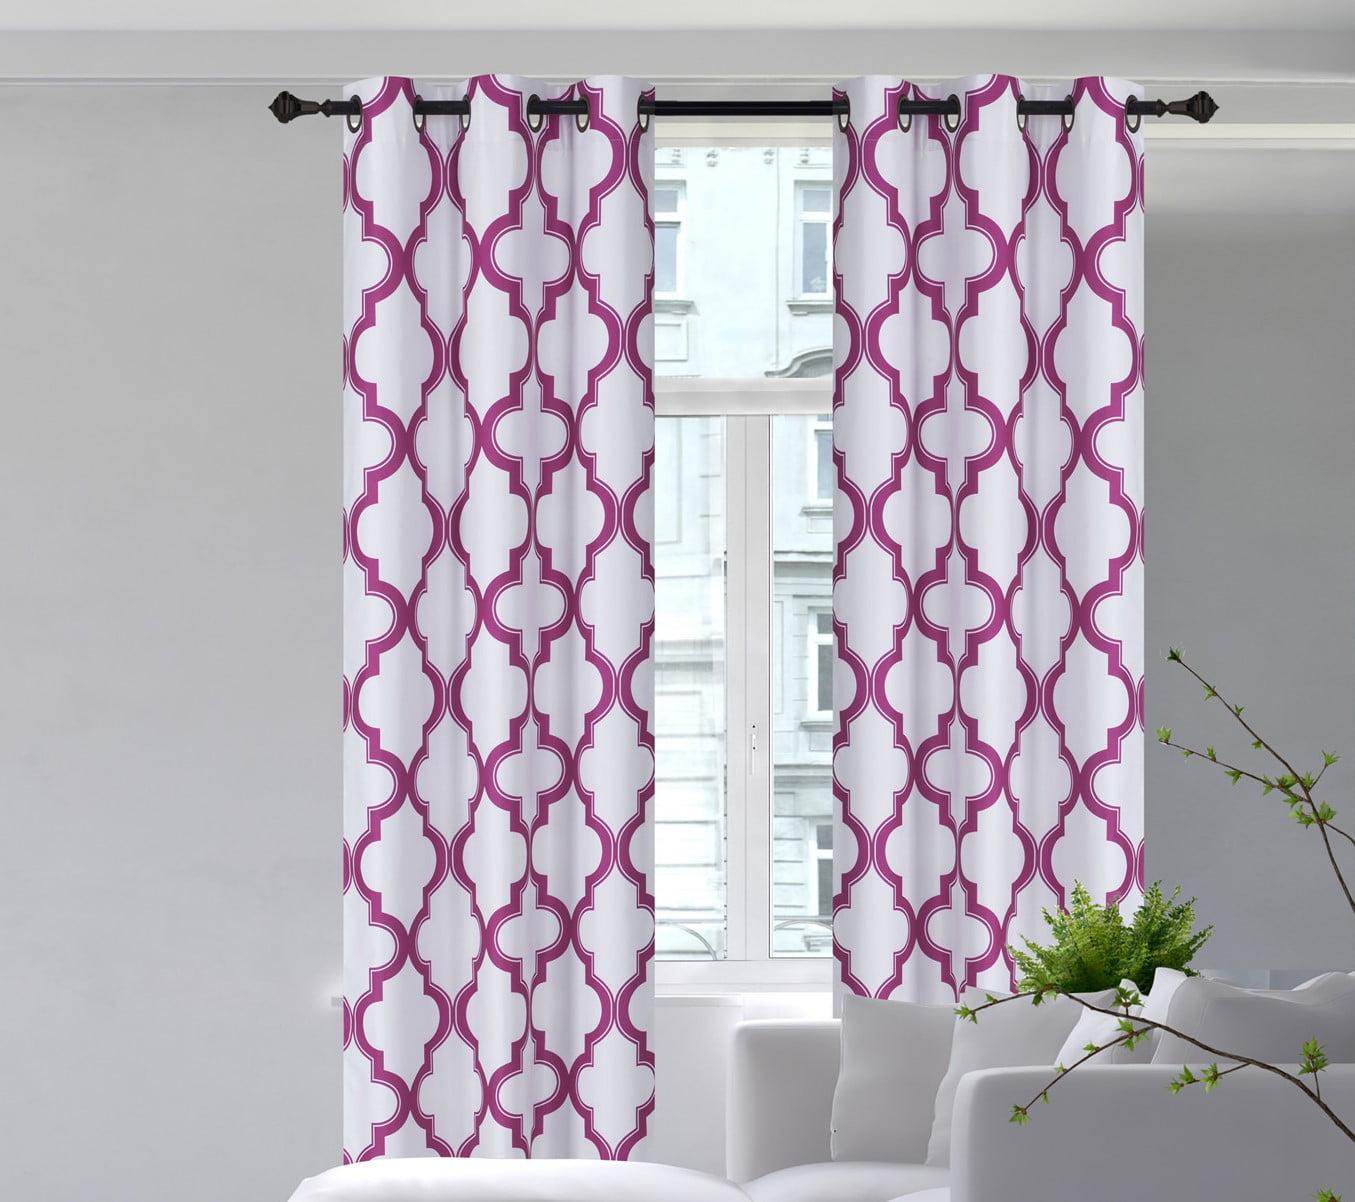 Sss 2 Pc Hot Pink Solid Blackout Room Darkening Panel Curtain Set Two 2 Window Treatments Of 37 Wide X 84 Length Each Panel Walmart Com Walmart Com